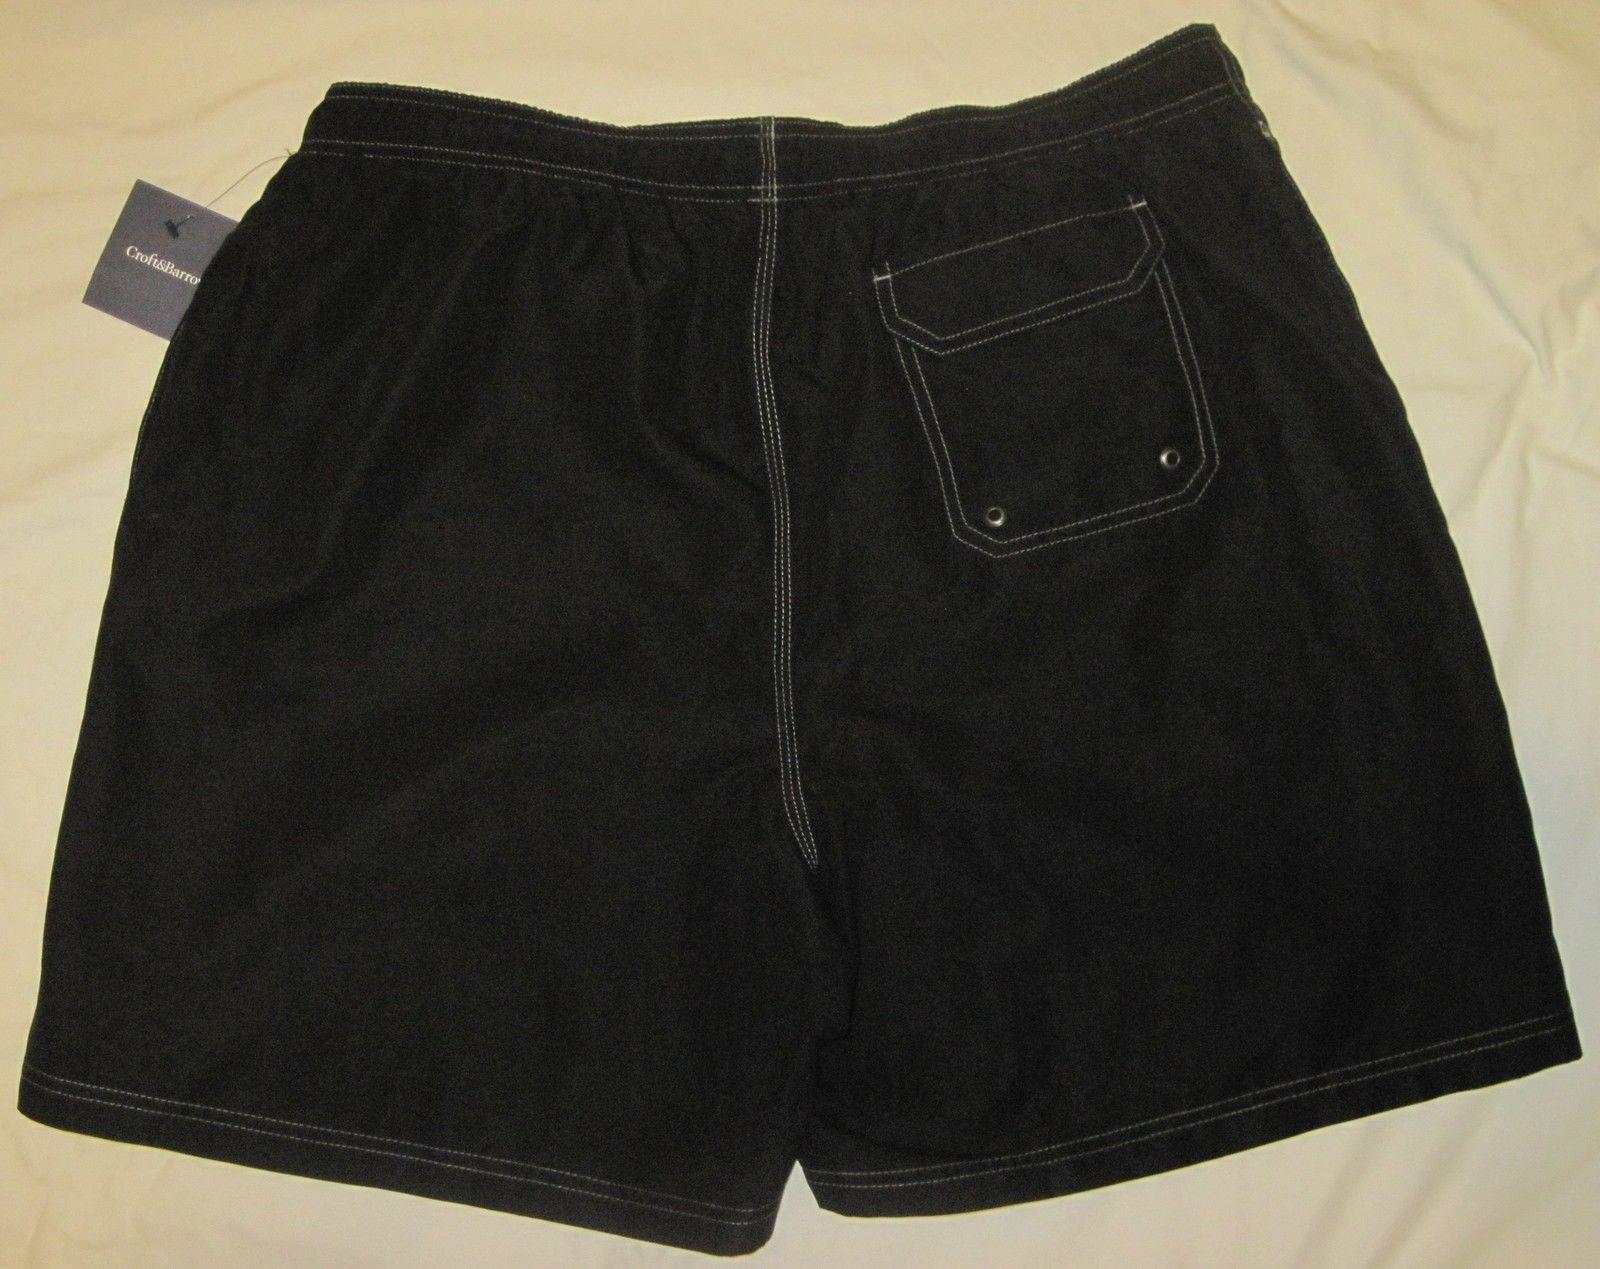 NWT CROFT & BARROW Swim Bathing Suit Trunks Mens XXL black or gray solid Poly image 4